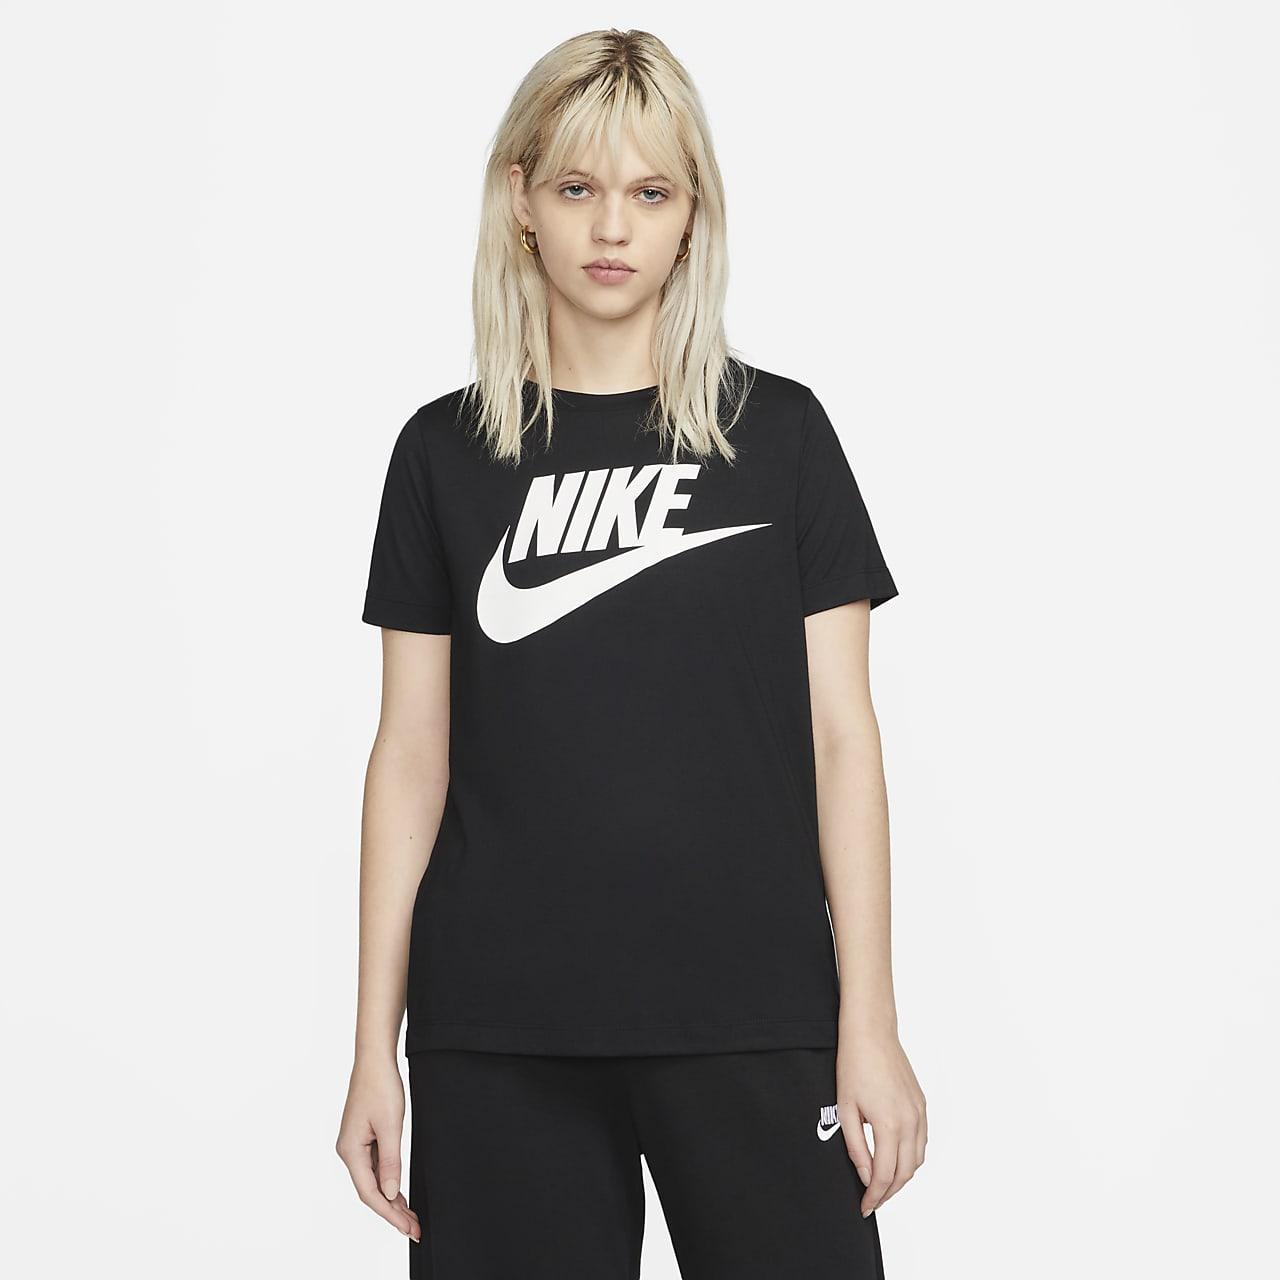 e2933e7b6d Nike Sportswear Essential Women s Logo Short-Sleeve Top. Nike.com GB